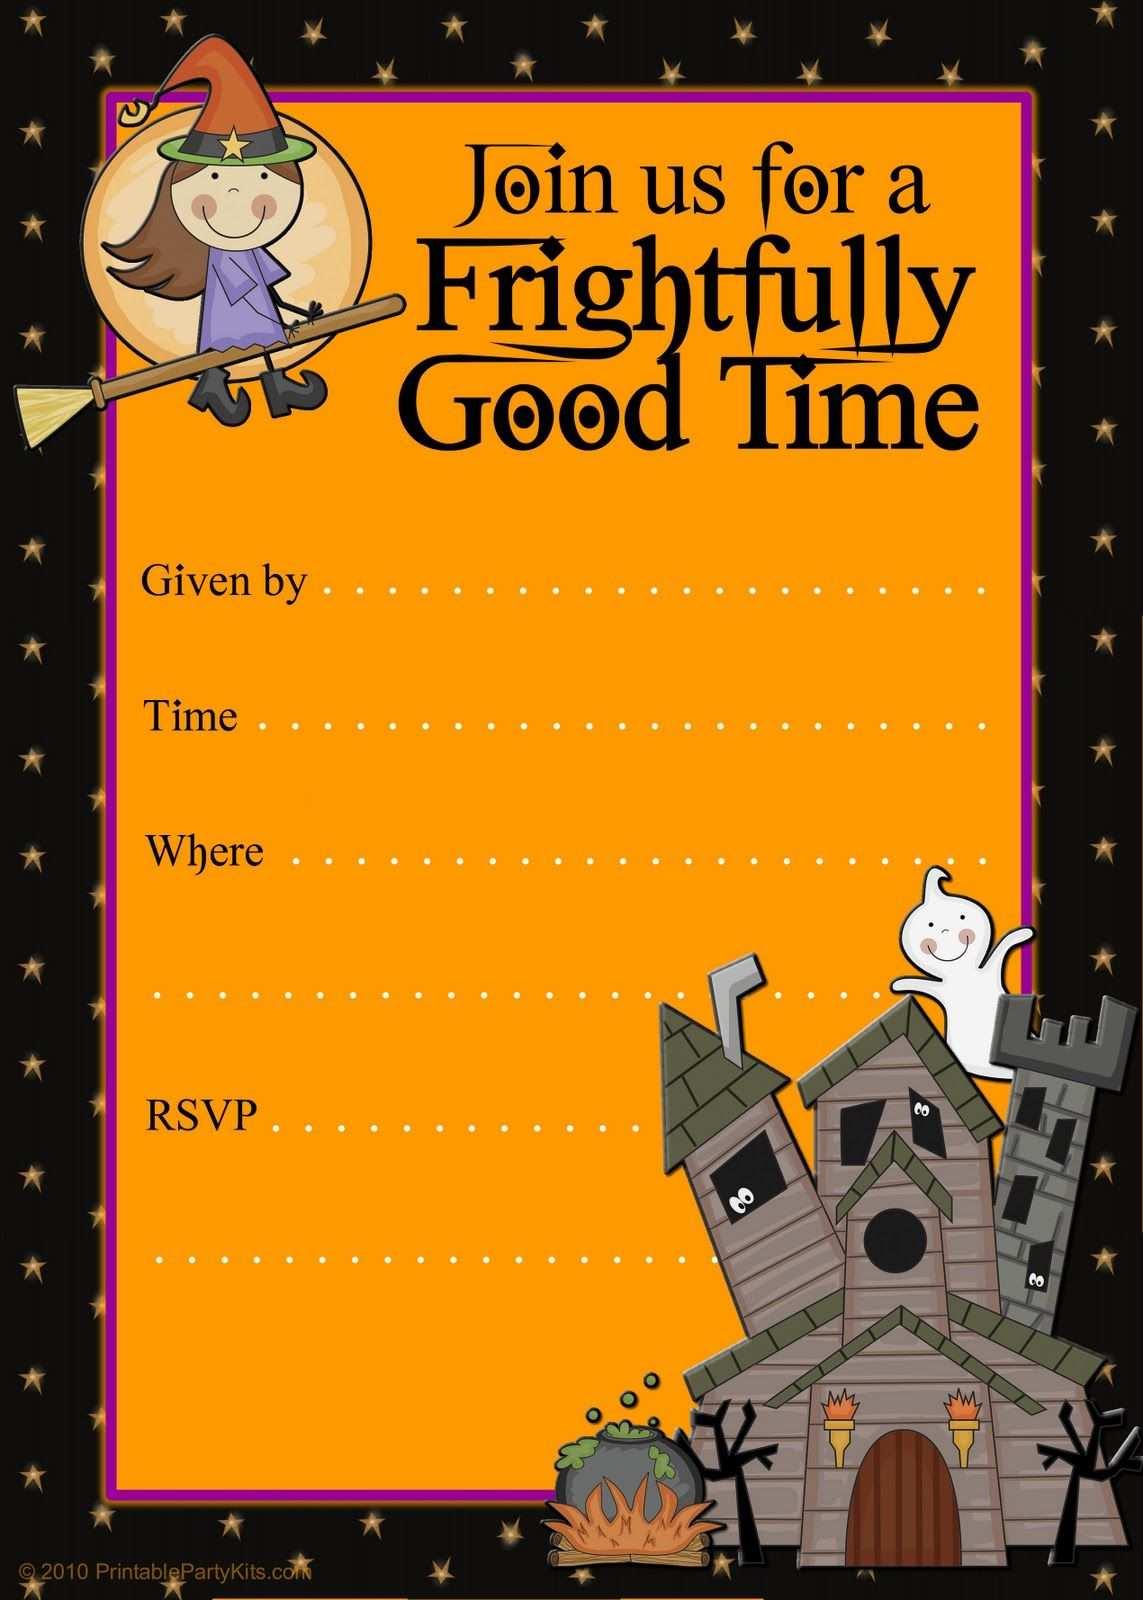 66 Printable Halloween Flyers Templates Free For Halloween Flyers Templates Free Cards Design Templates